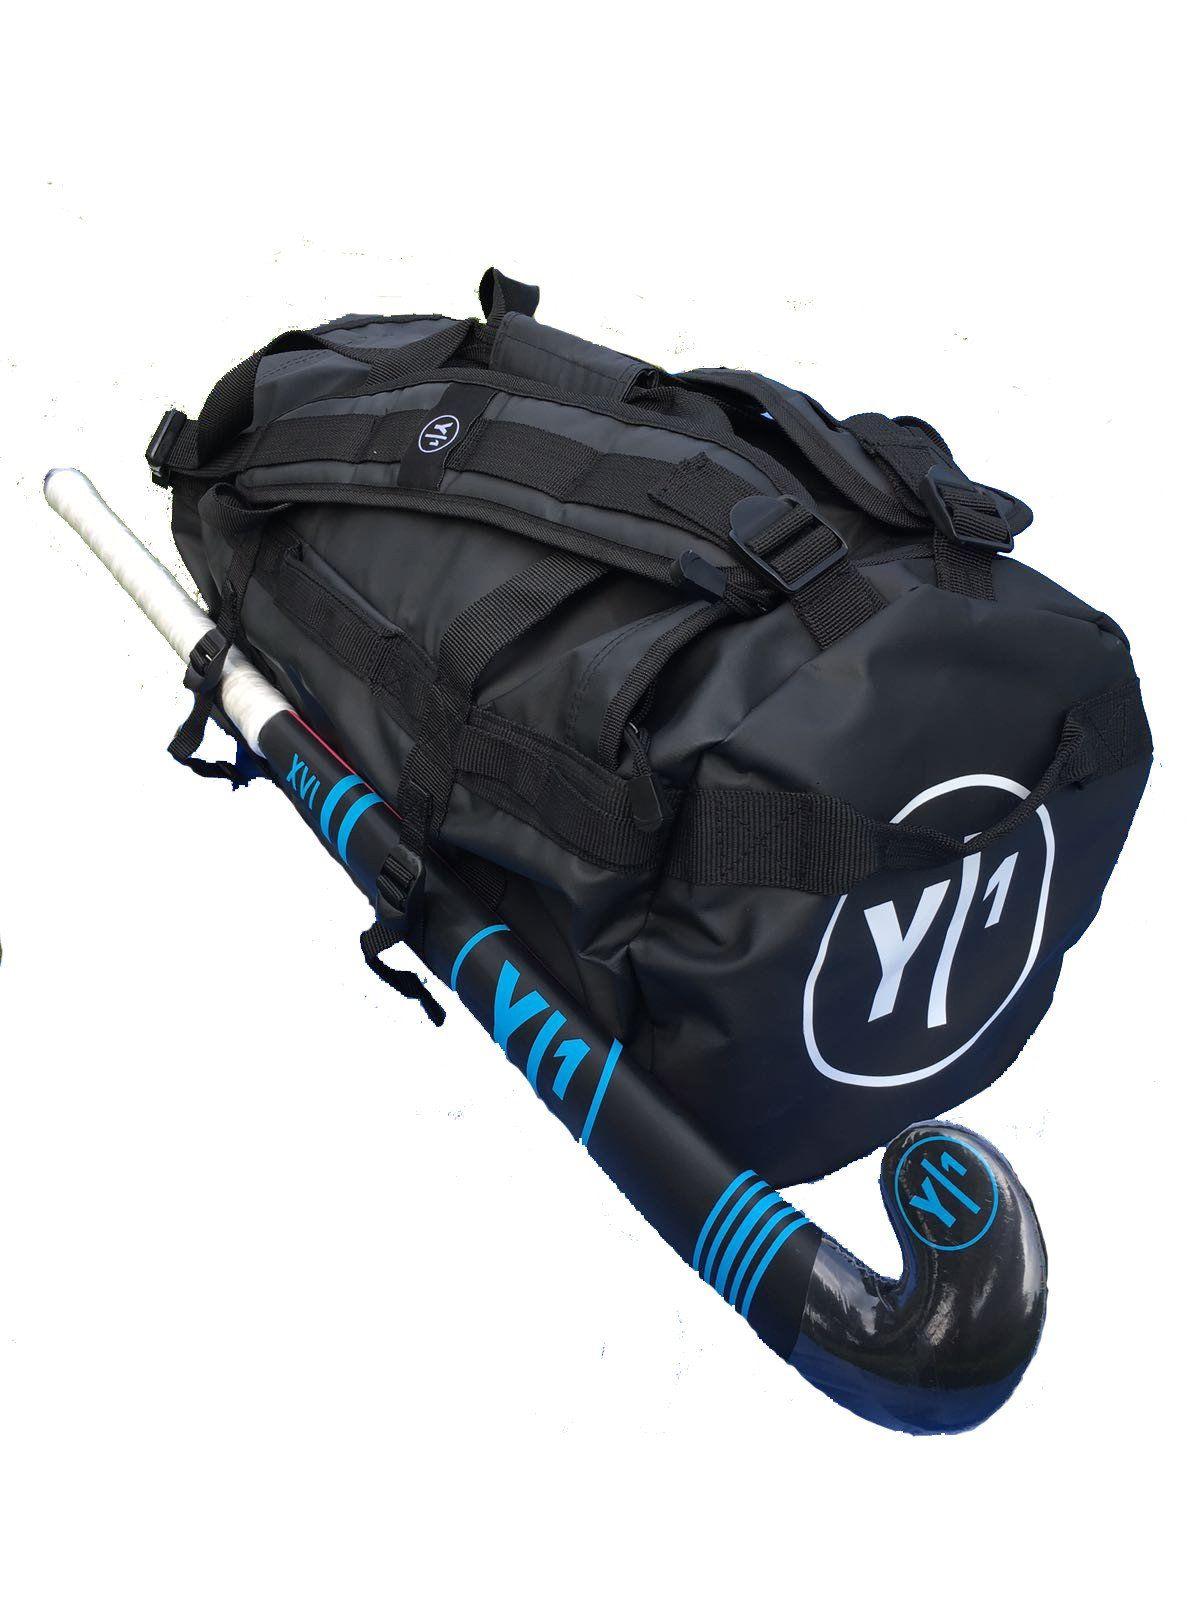 Y1 Hockey London Matchday Bag online kopen